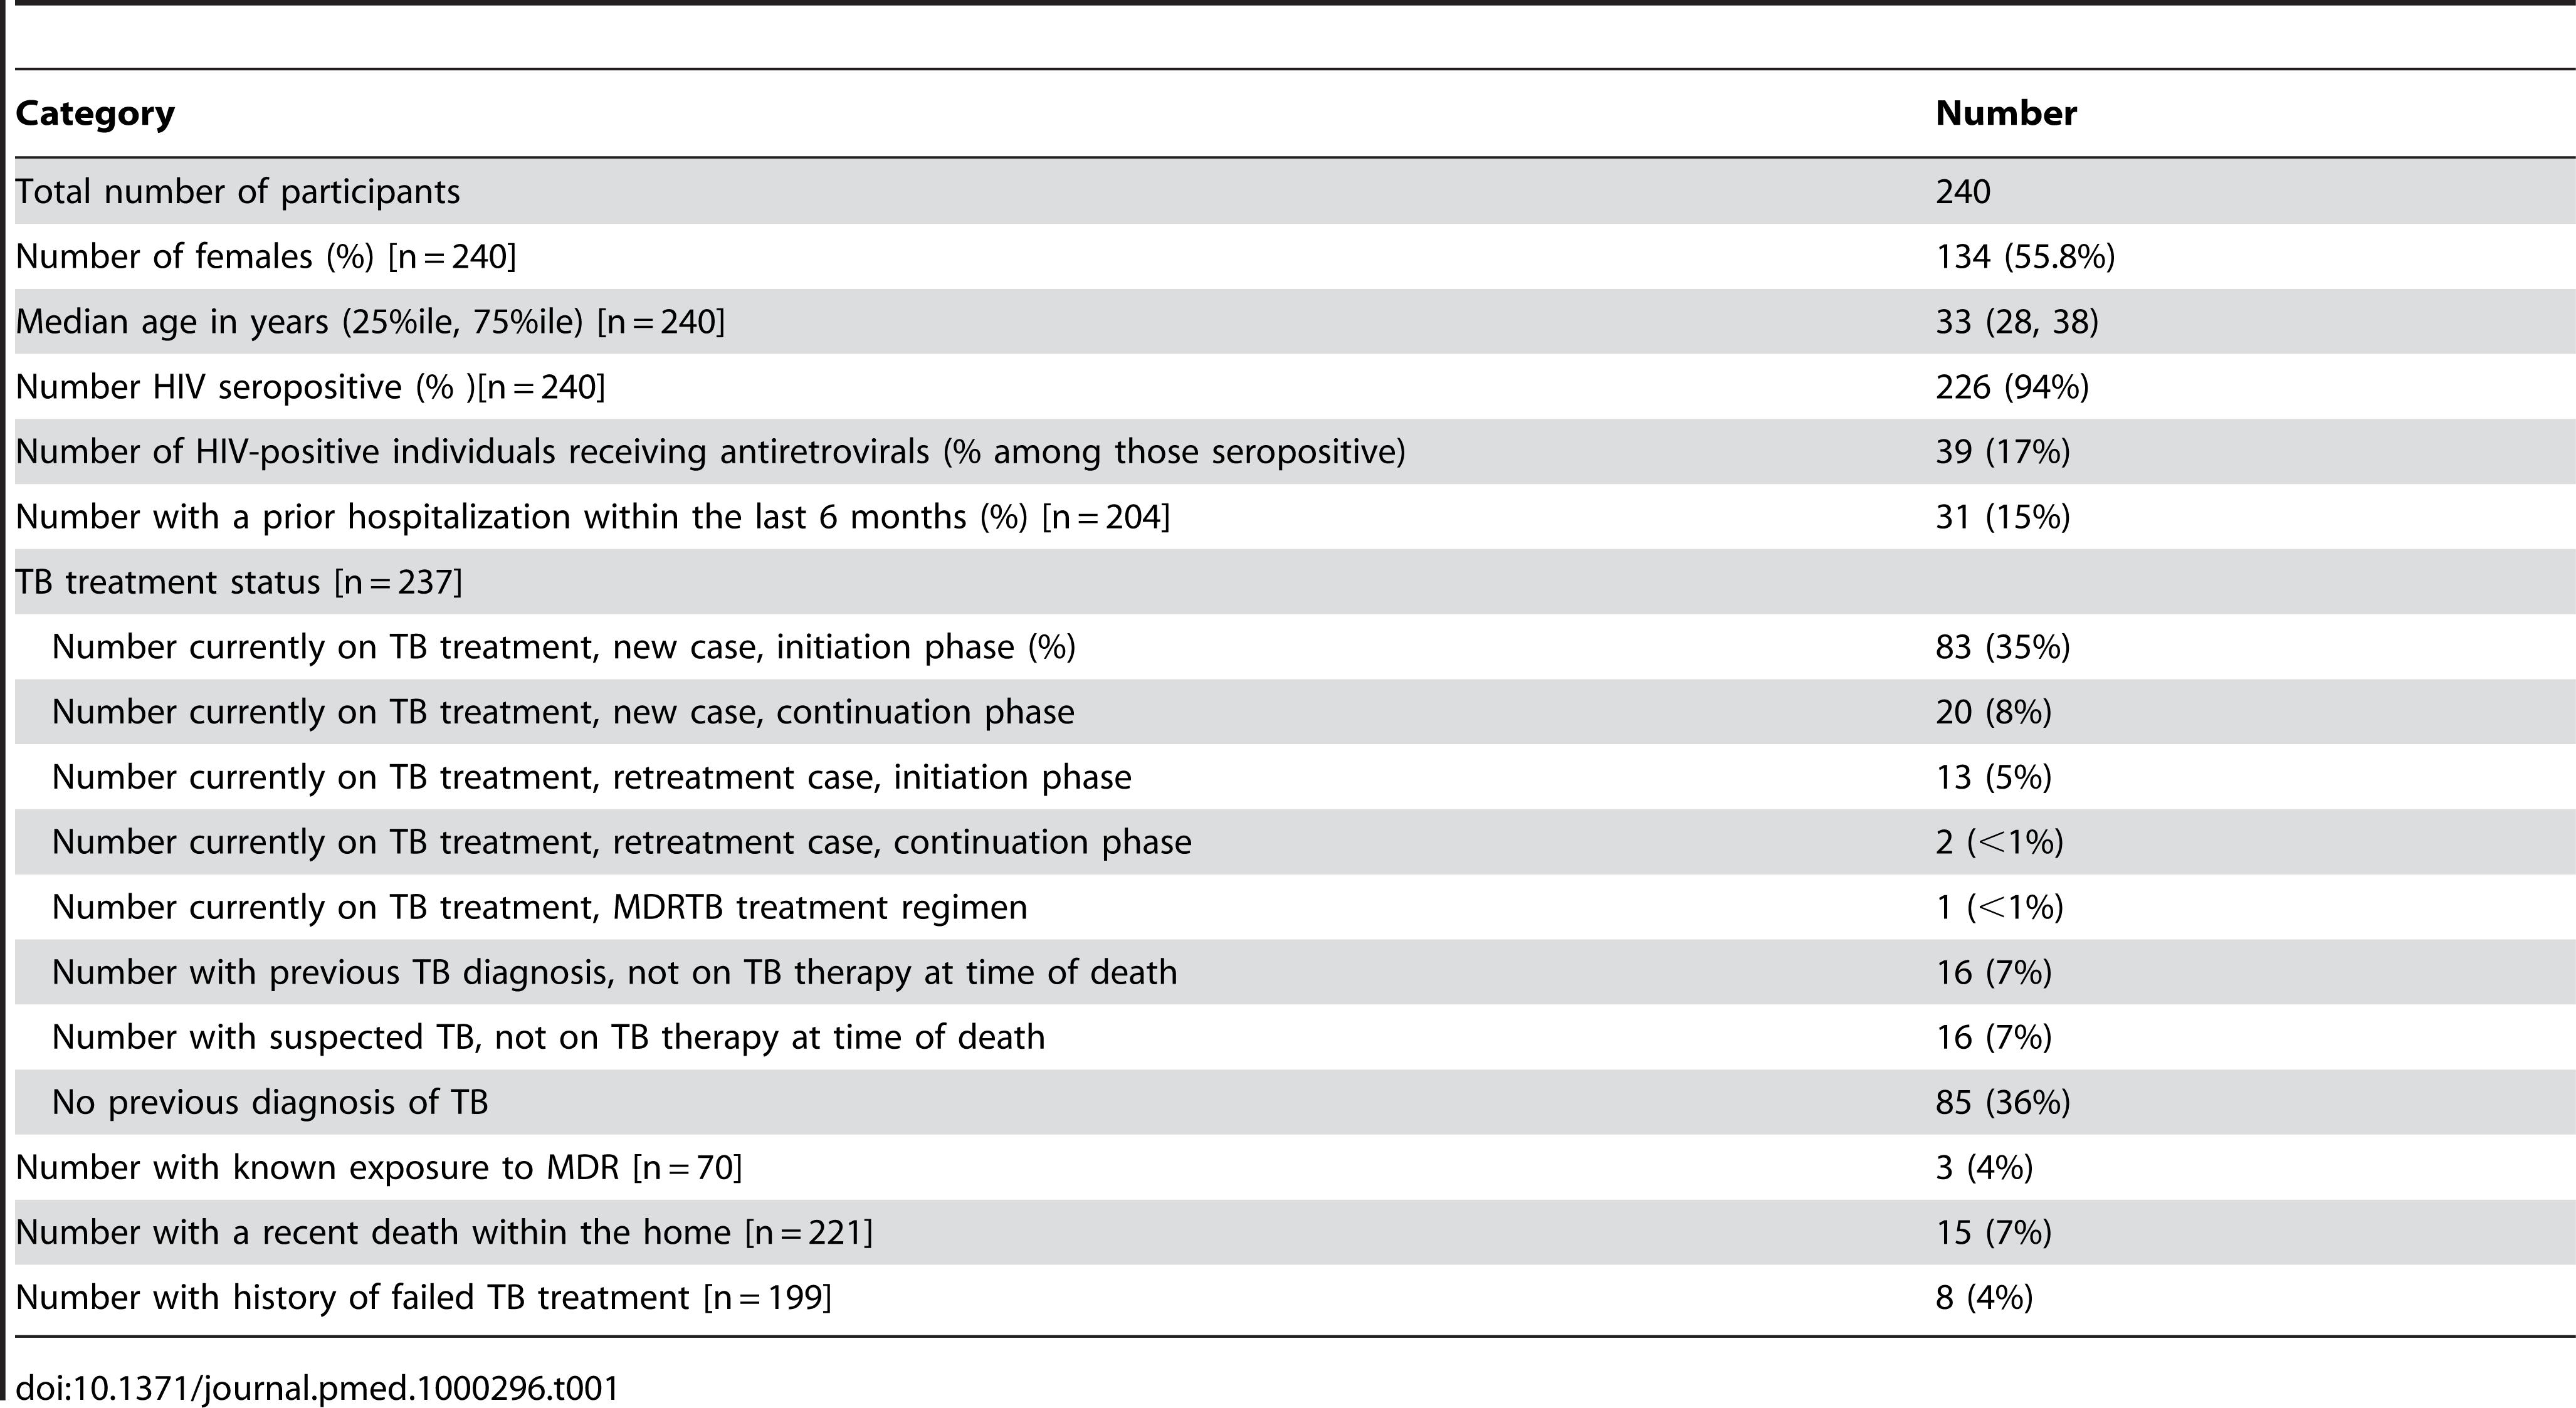 Study population characteristics.